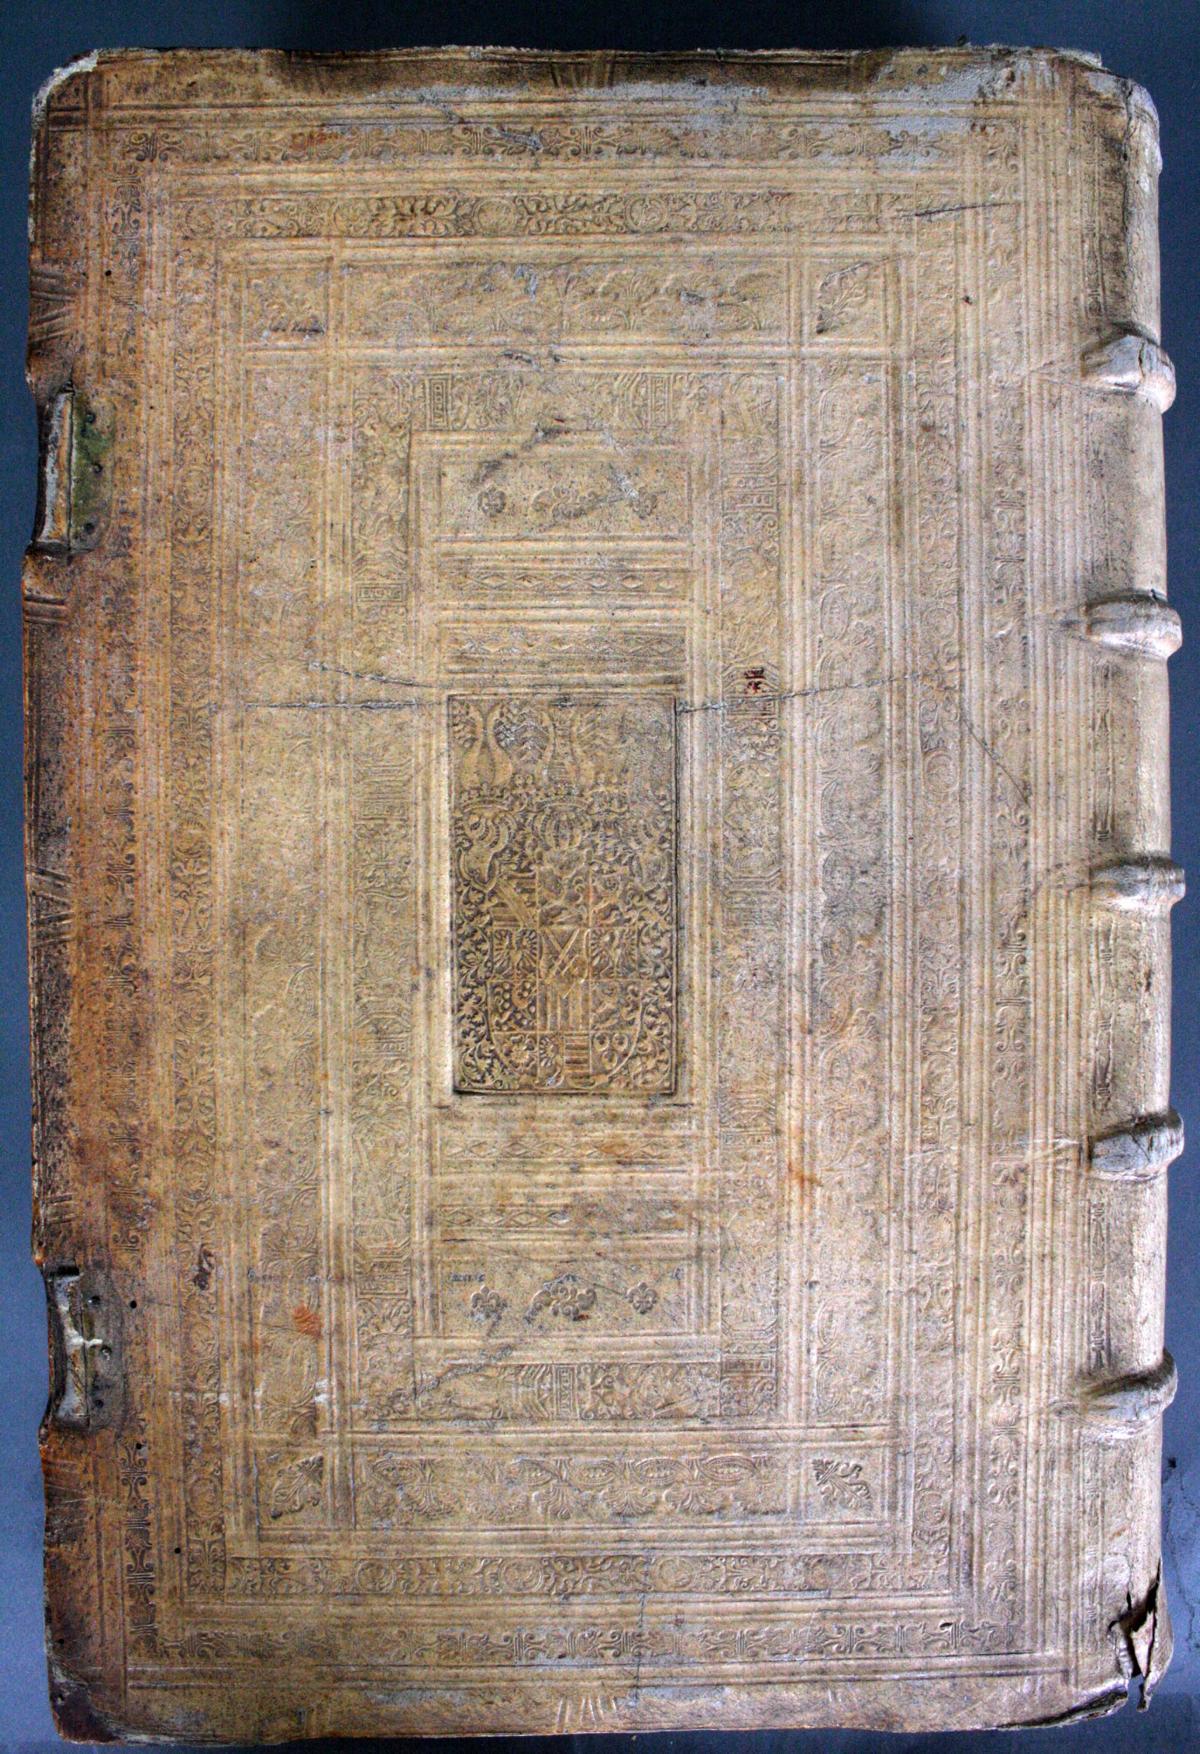 Griechische-Lateinische Bibel, Novum Testamentum 1582-21